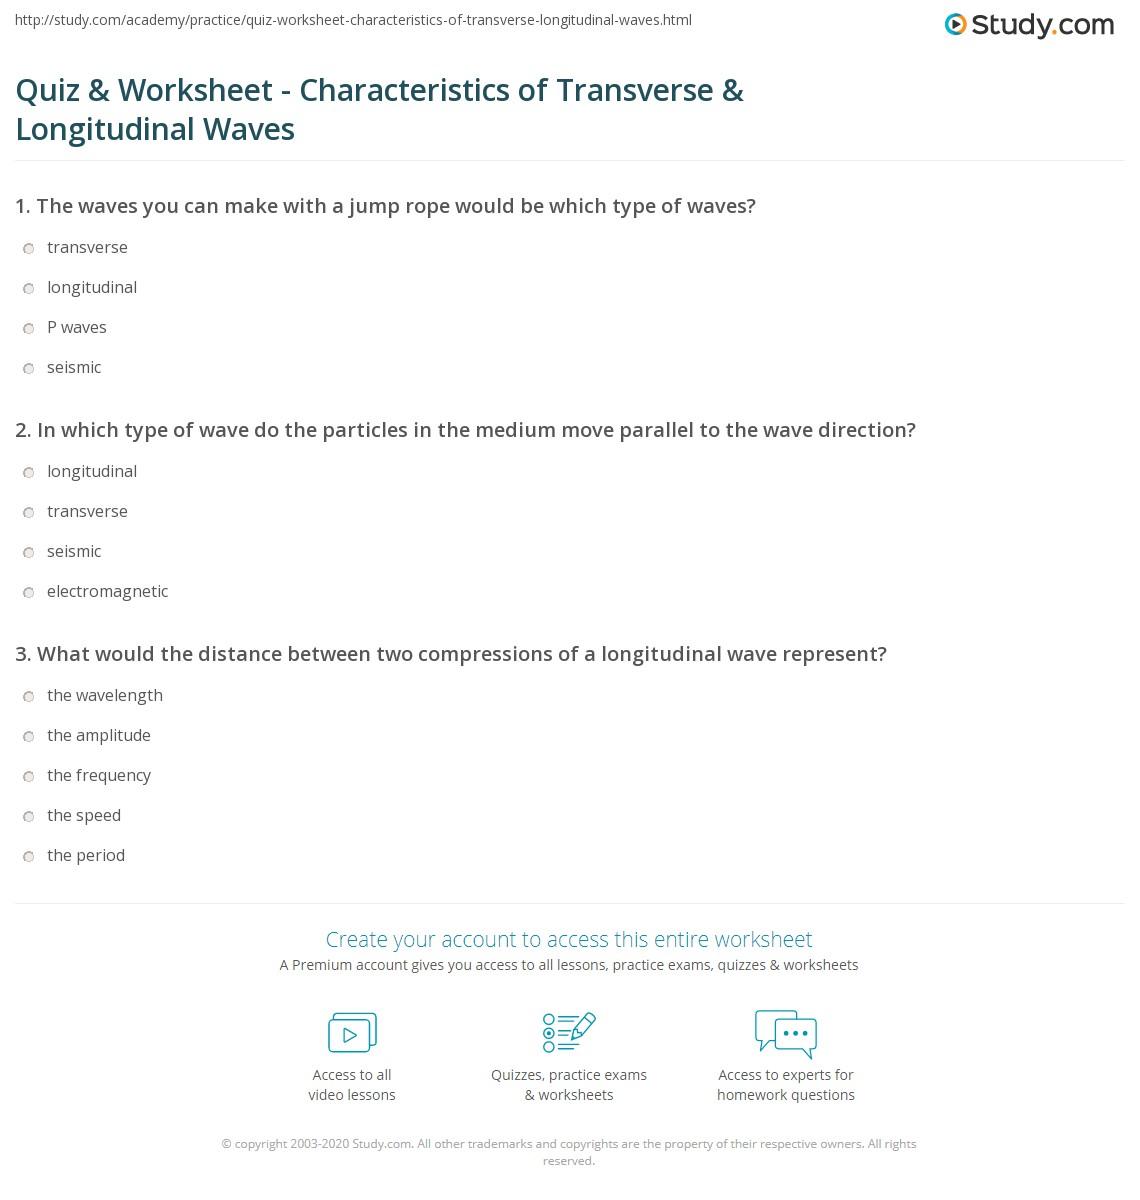 quiz worksheet characteristics of transverse longitudinal waves. Black Bedroom Furniture Sets. Home Design Ideas